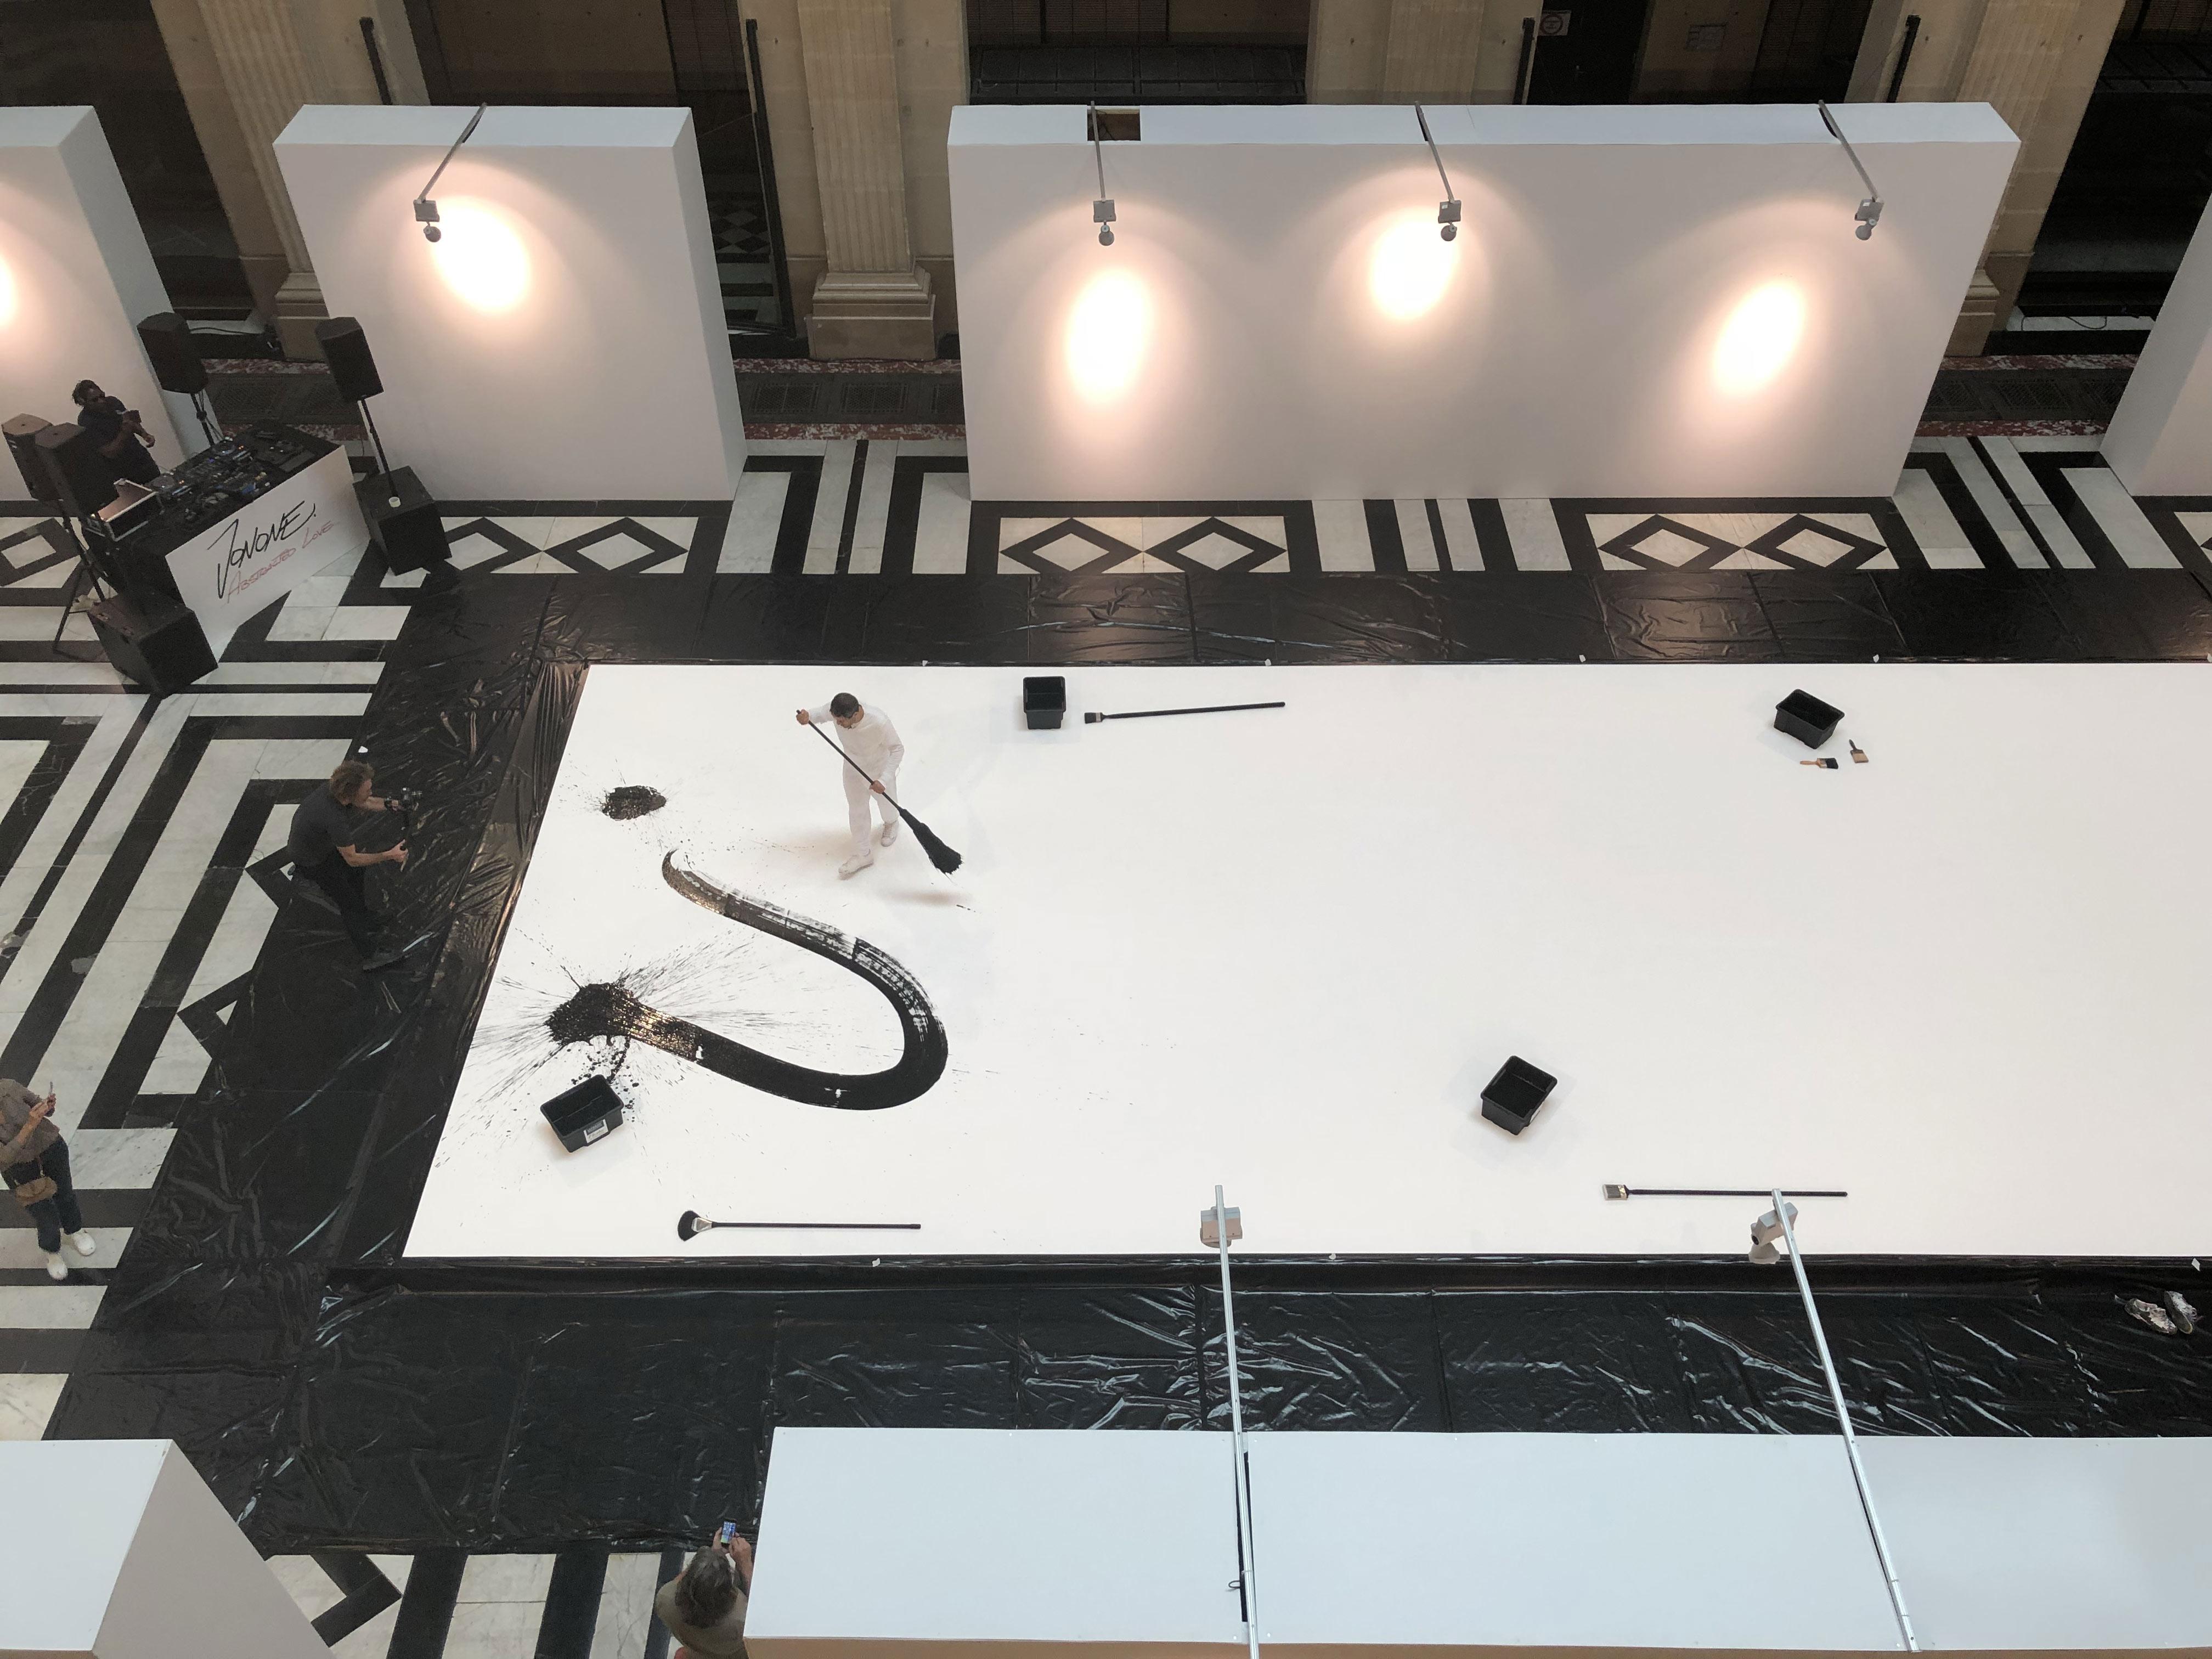 JonOne-live-painting-peinture-performance-artiste-art-contemporain-bache-toile-deco-decoration-aucop-event-evenementiel-abstracted-love-diary-galerie-david-pluskwa